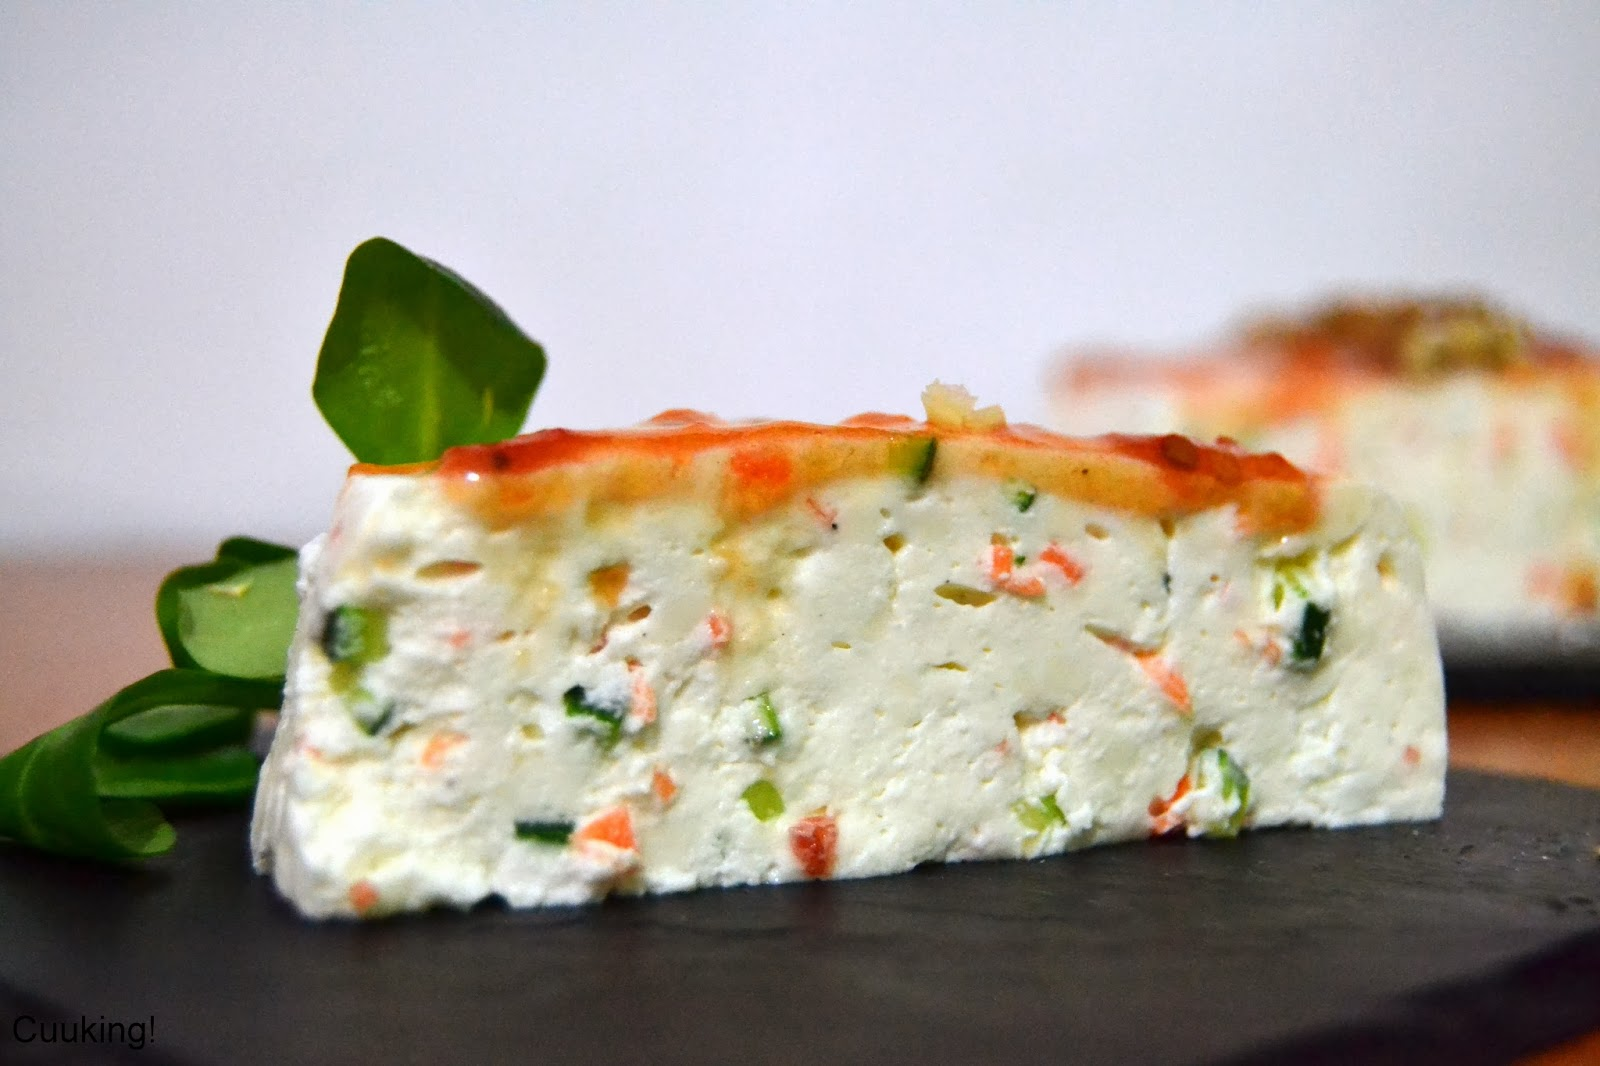 Pastel de zanahoria con queso filadelfia